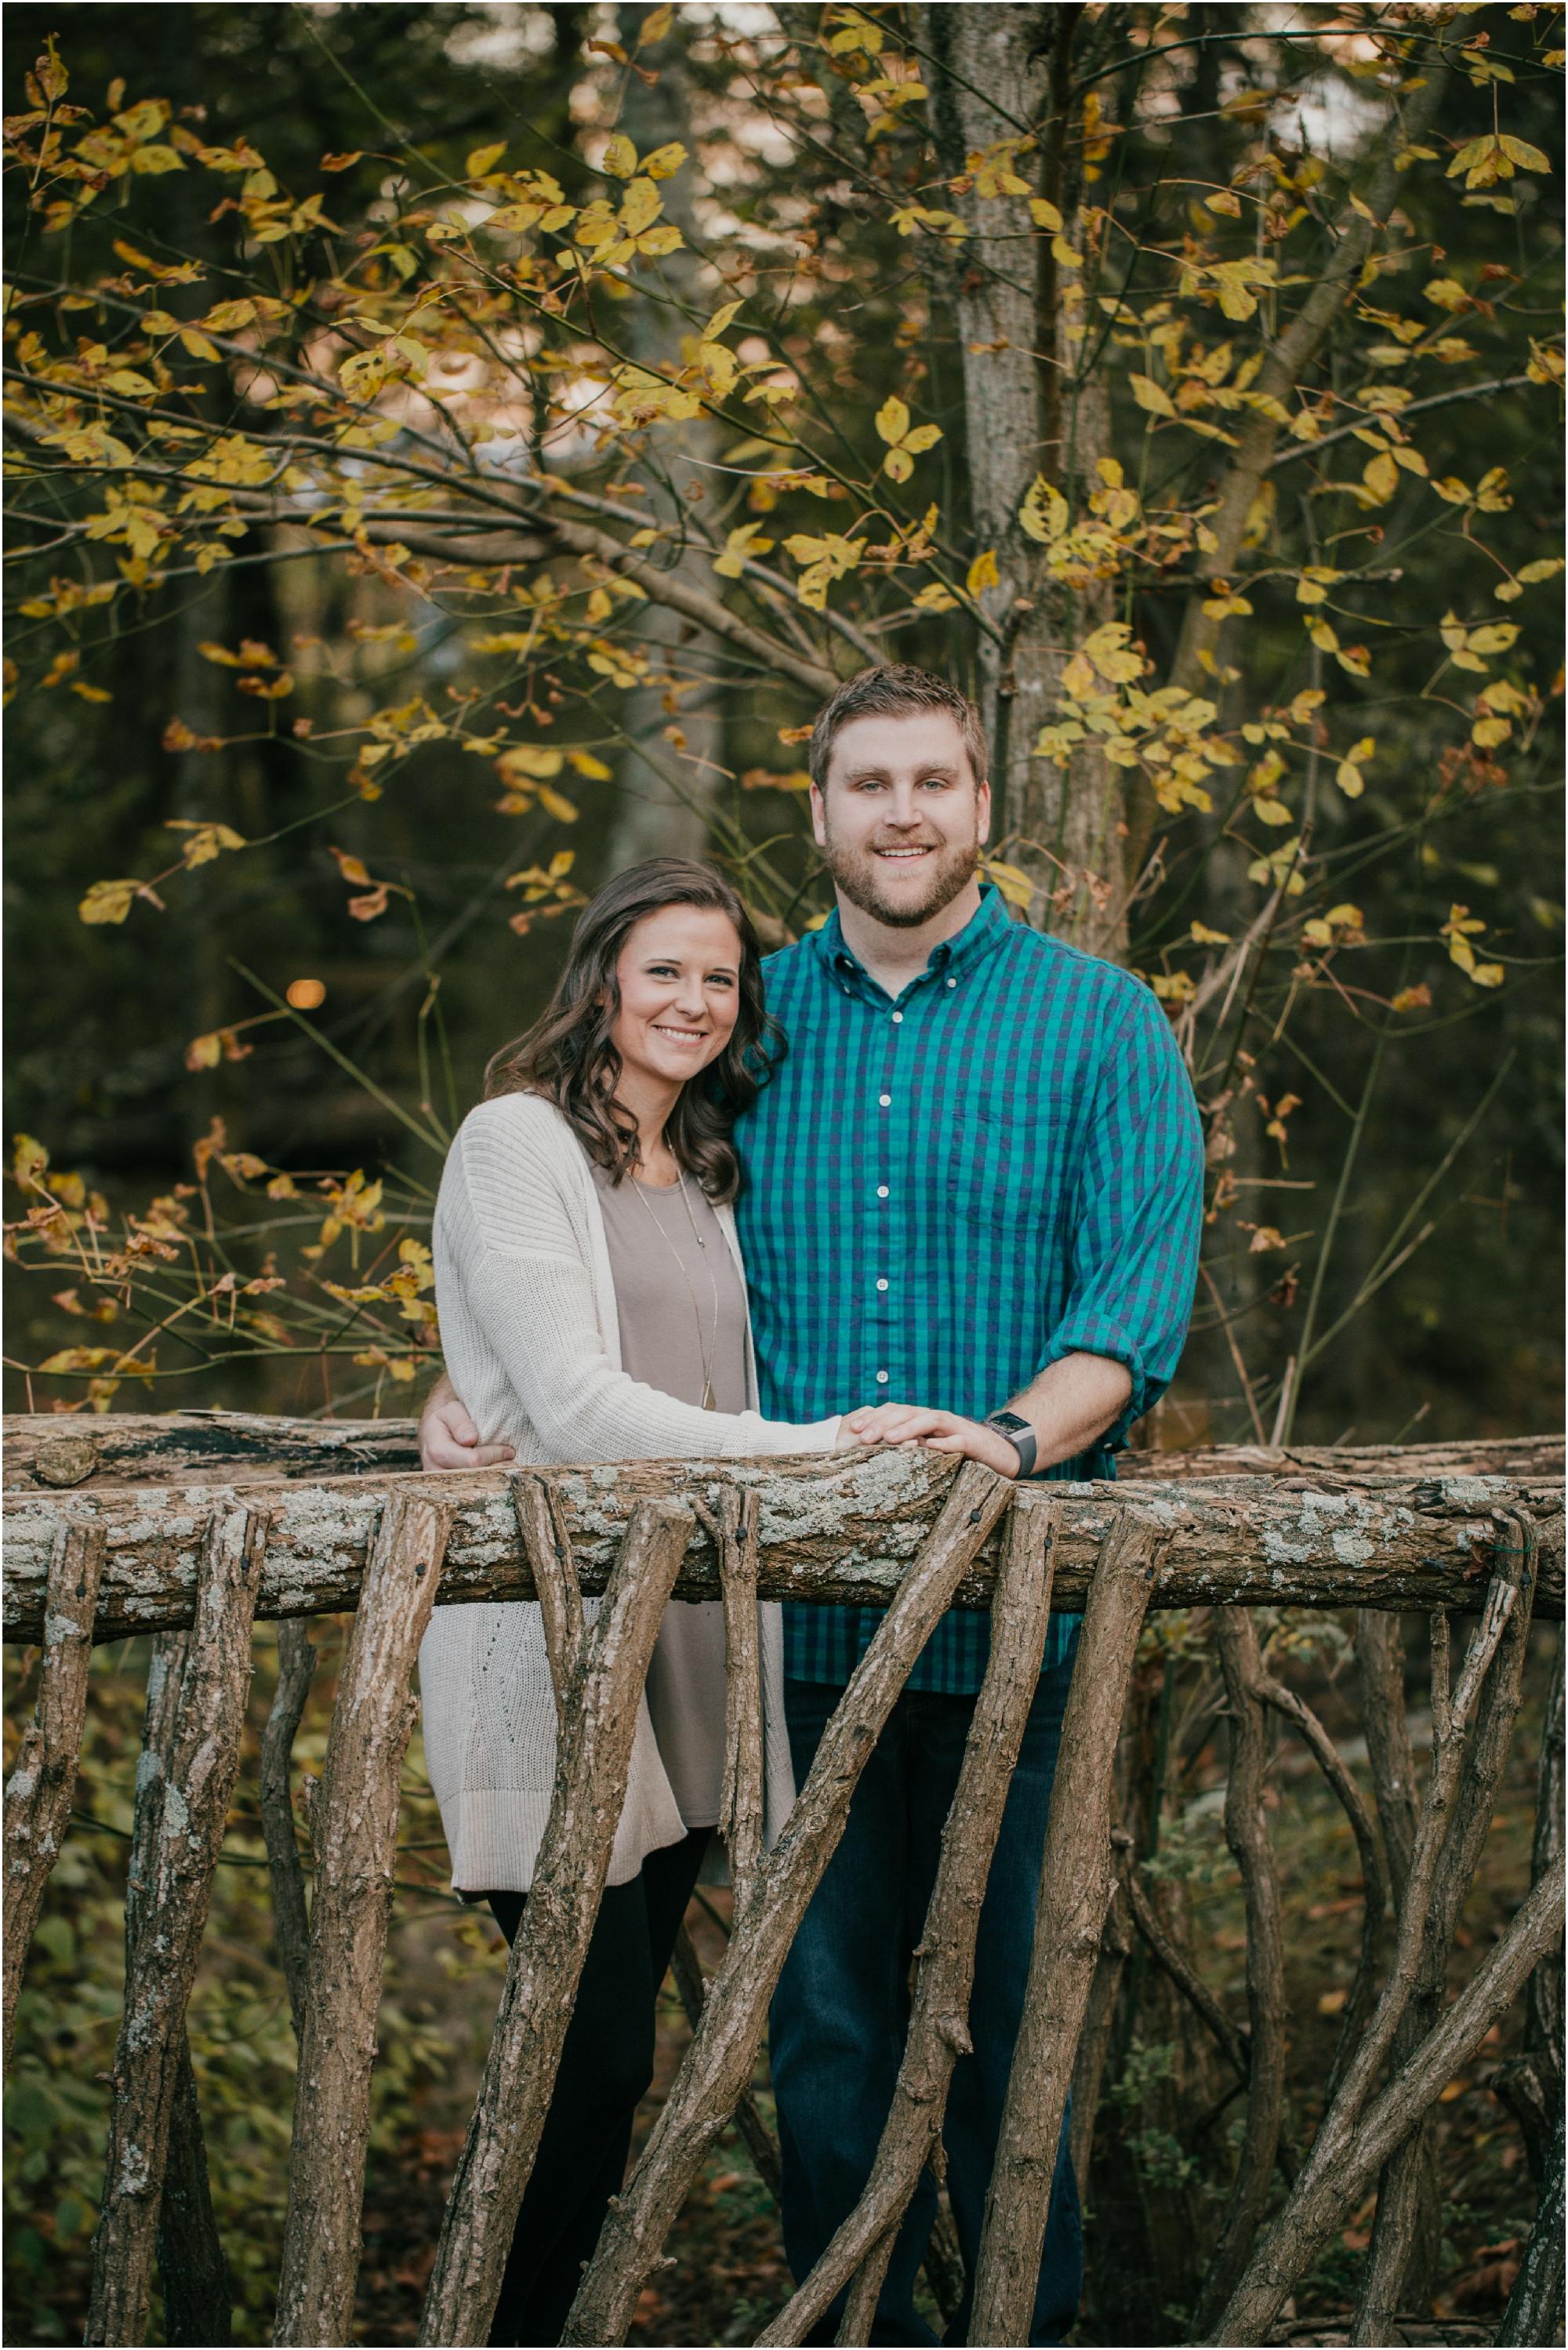 katy-sergent-millstone-limestone-tn-rustic-fall-engagement-session-adventurous-outdoors-intimate-elopement-wedding-northeast-johnson-city-photographer_0021.jpg